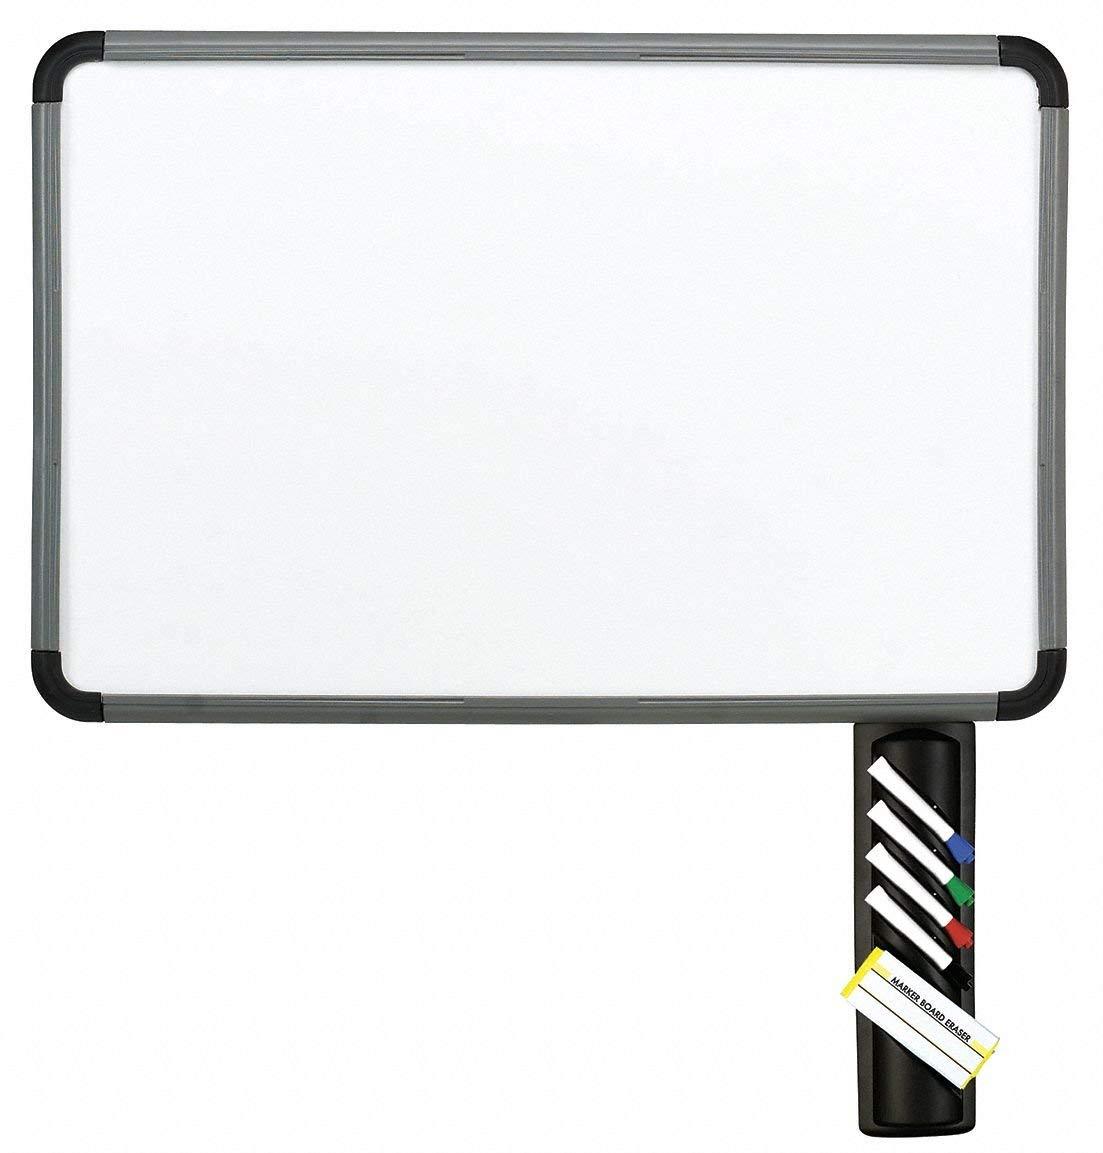 "Iceberg Gloss-Finish Melamine Dry Erase Board, Wall Mounted, 24""H x 36""W, White"